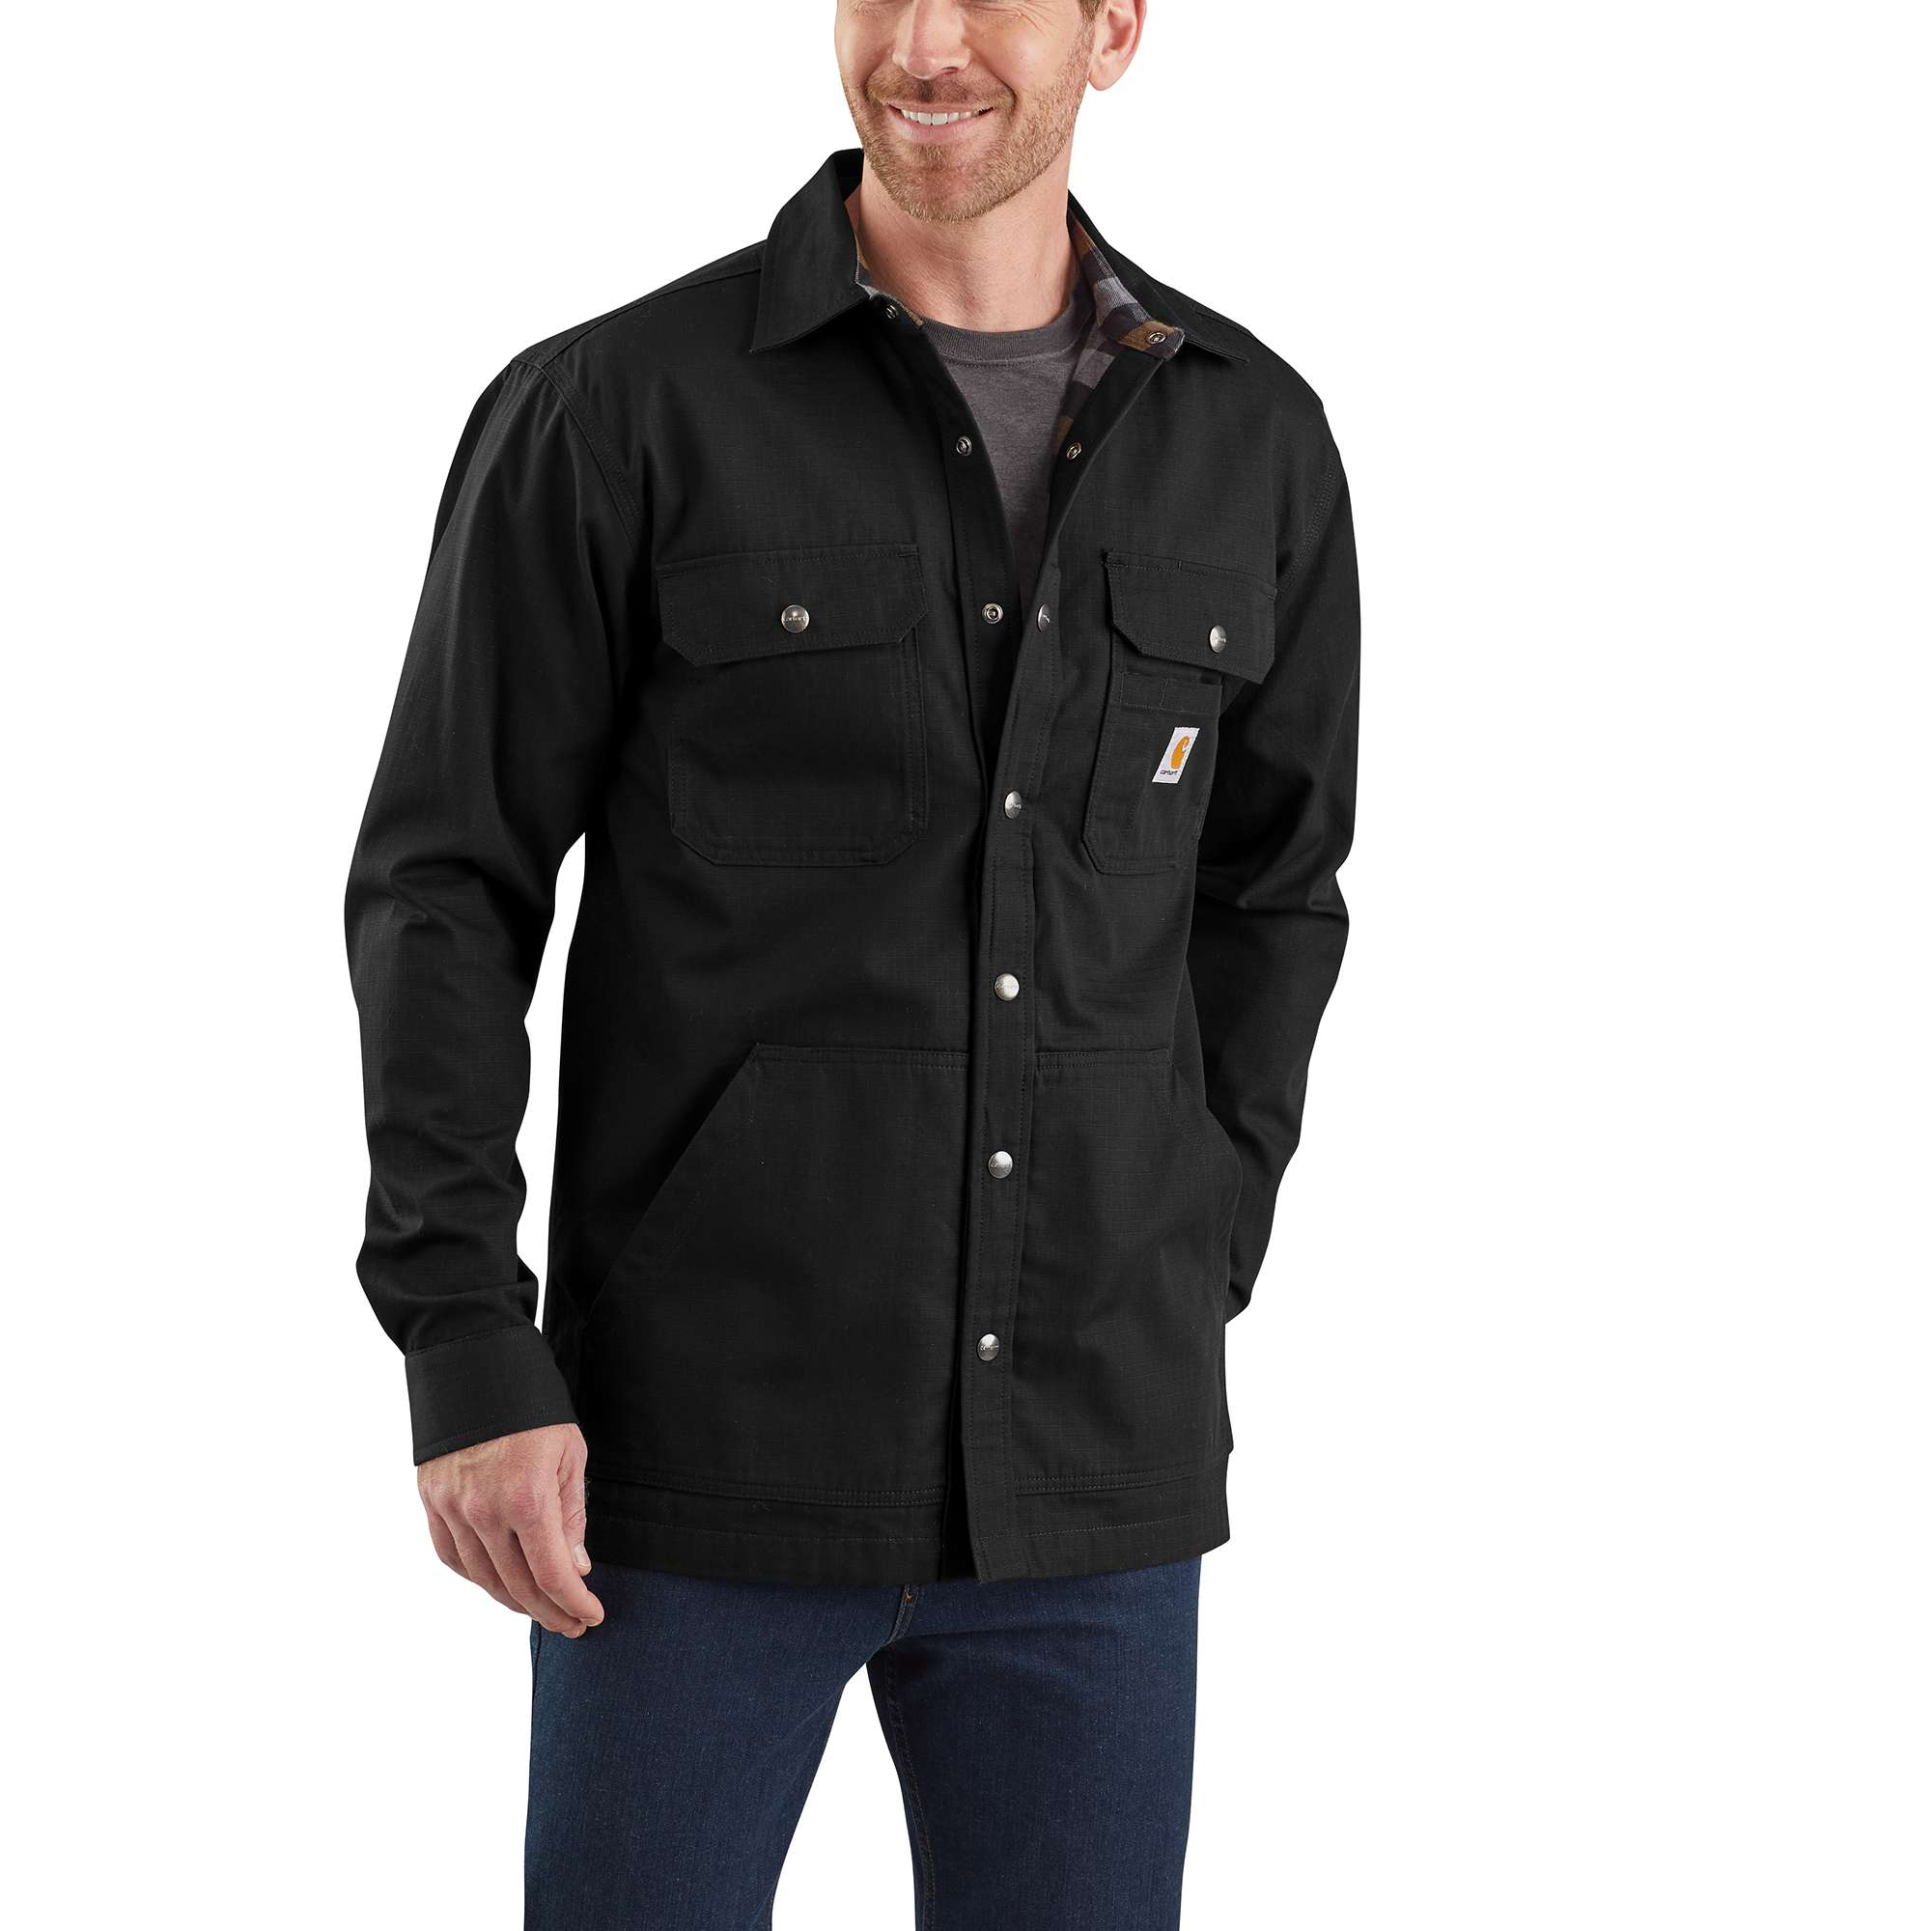 Carhartt Ripstop Solid Shirt Jac